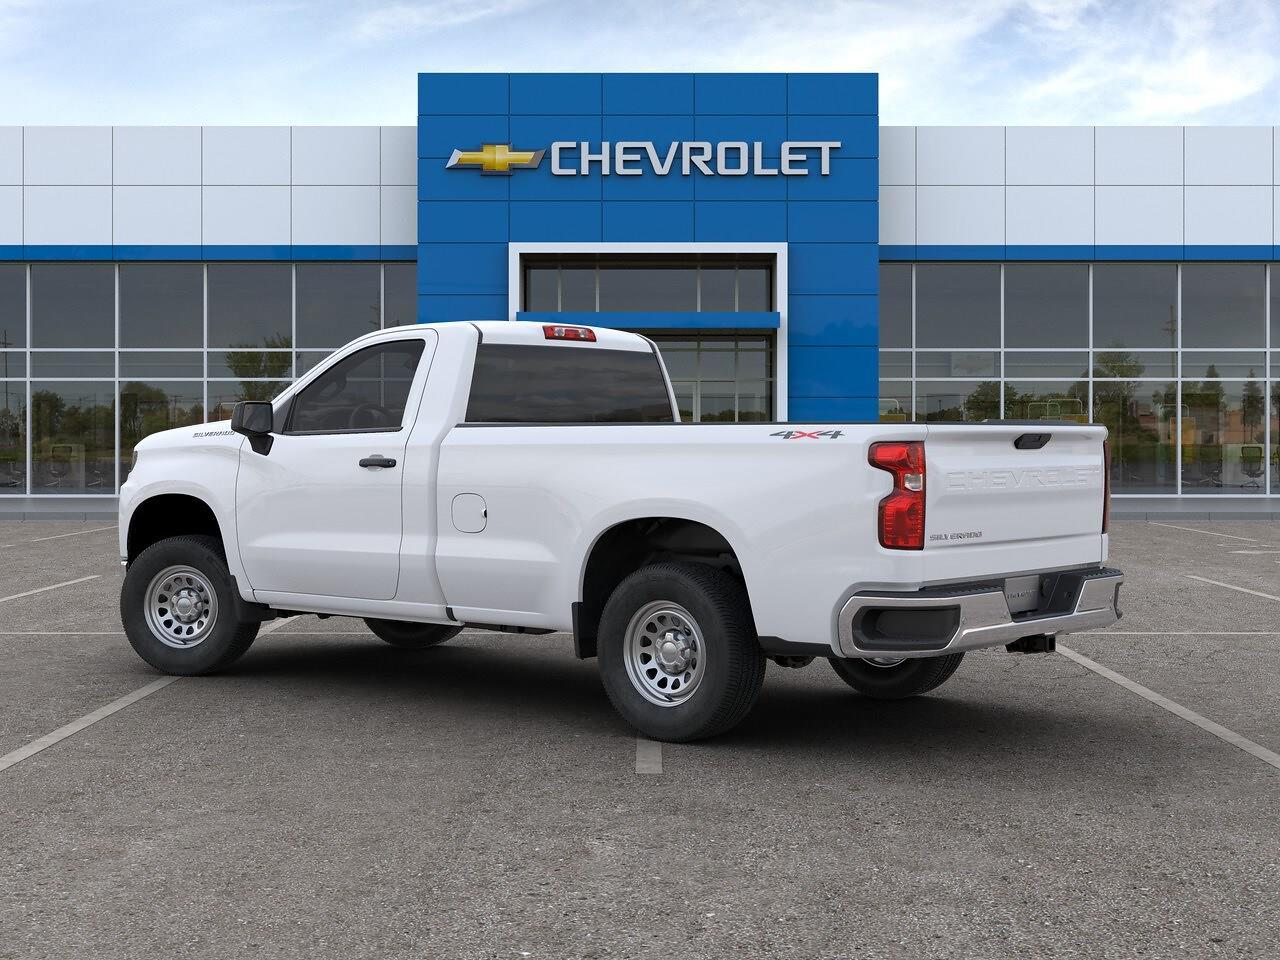 2020 Chevrolet Silverado 1500 Regular Cab 4x4, Pickup #CT20314 - photo 1